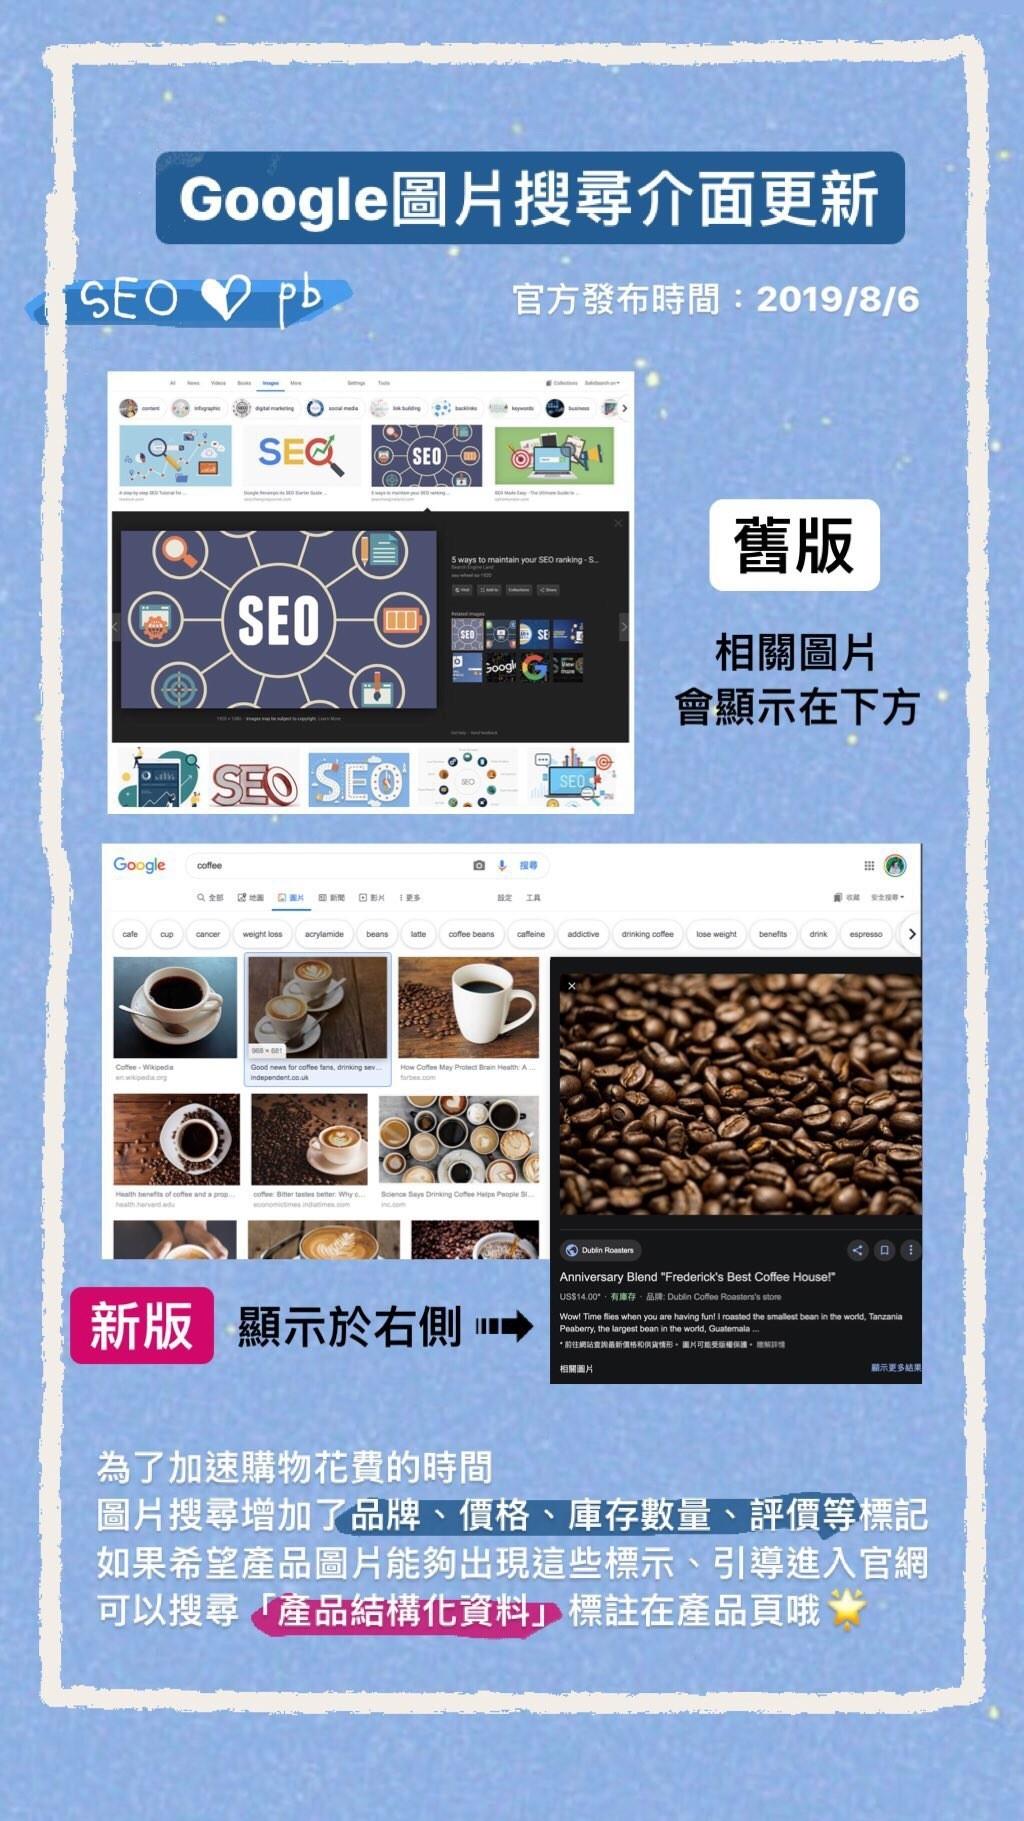 Google圖片搜尋介面更新|seo_pb Instagram